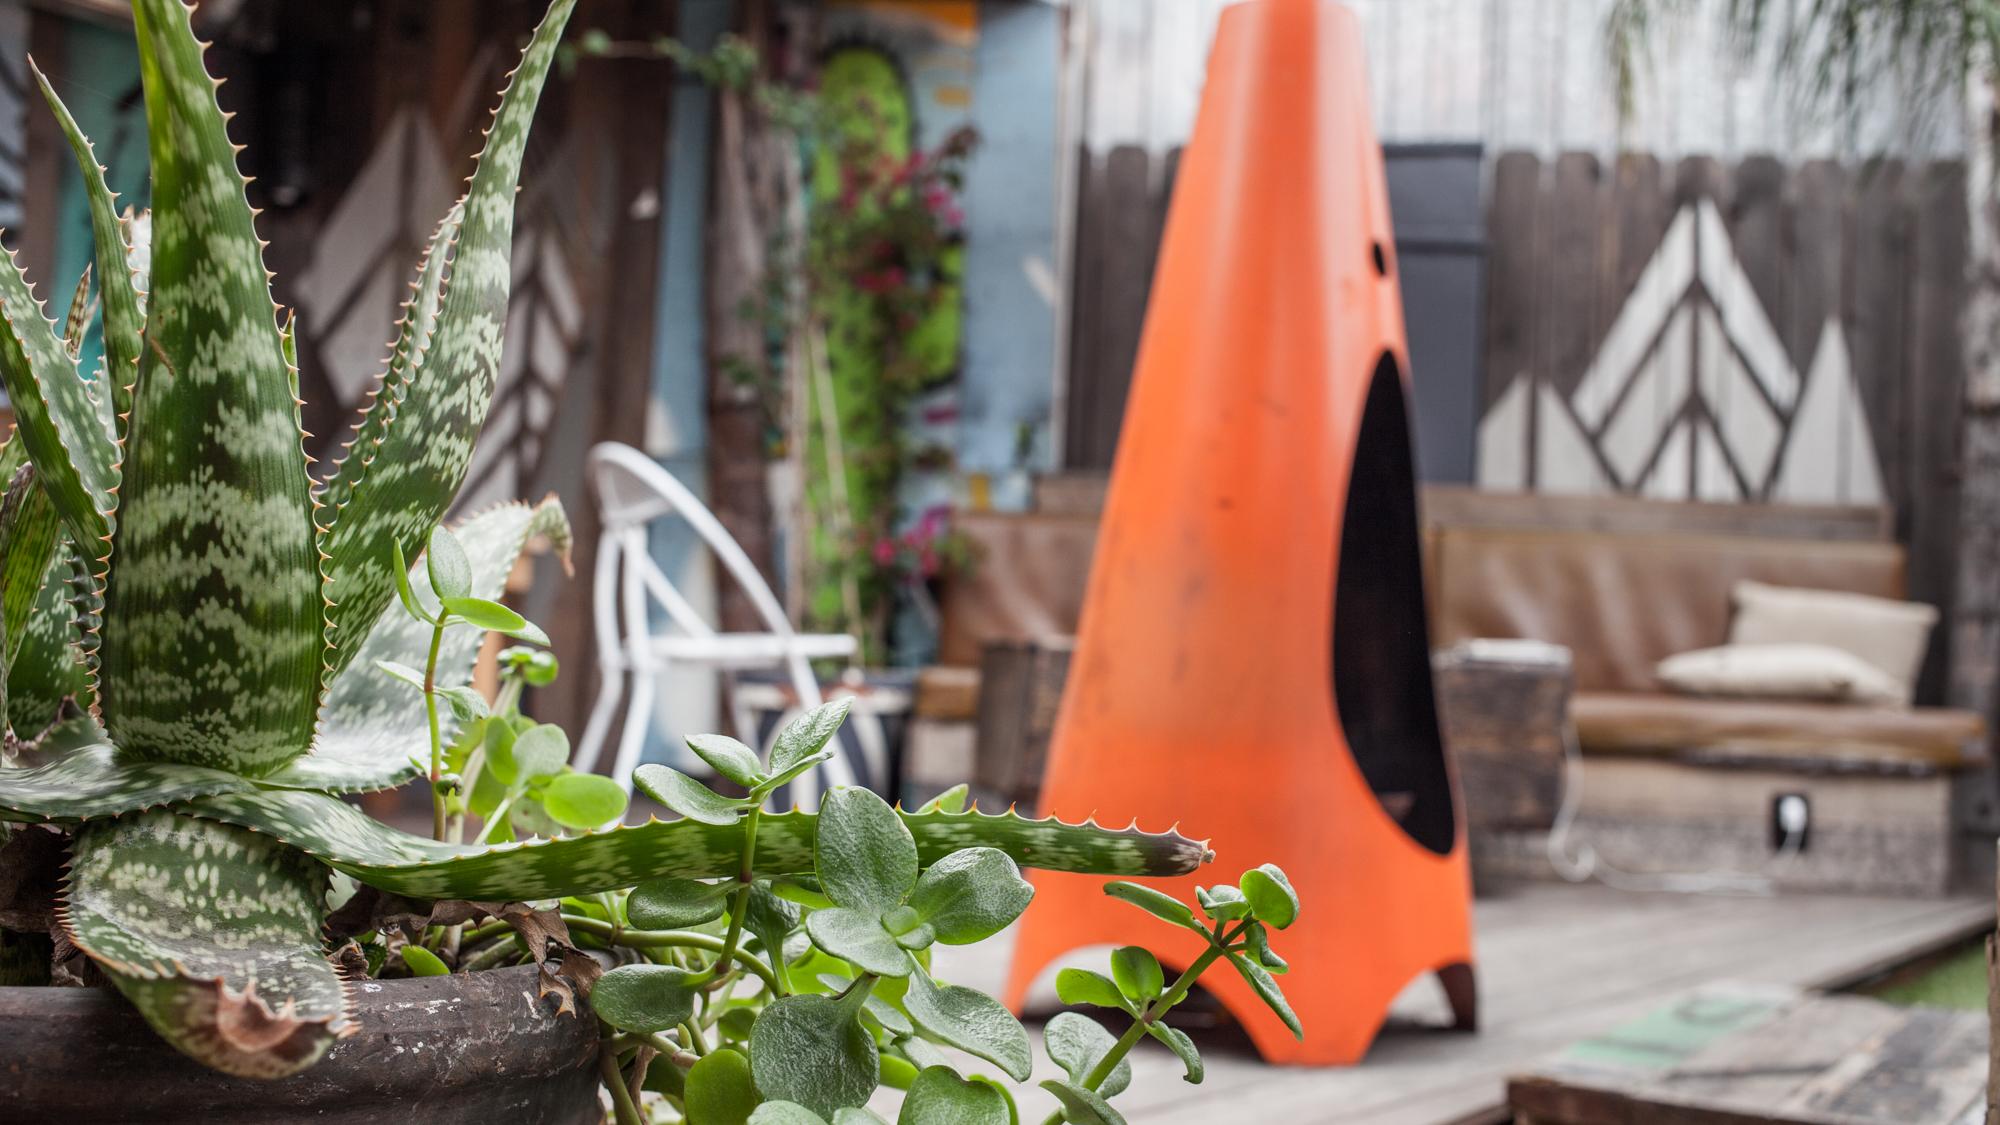 Modfire Fire Pits — perfect patio decor.